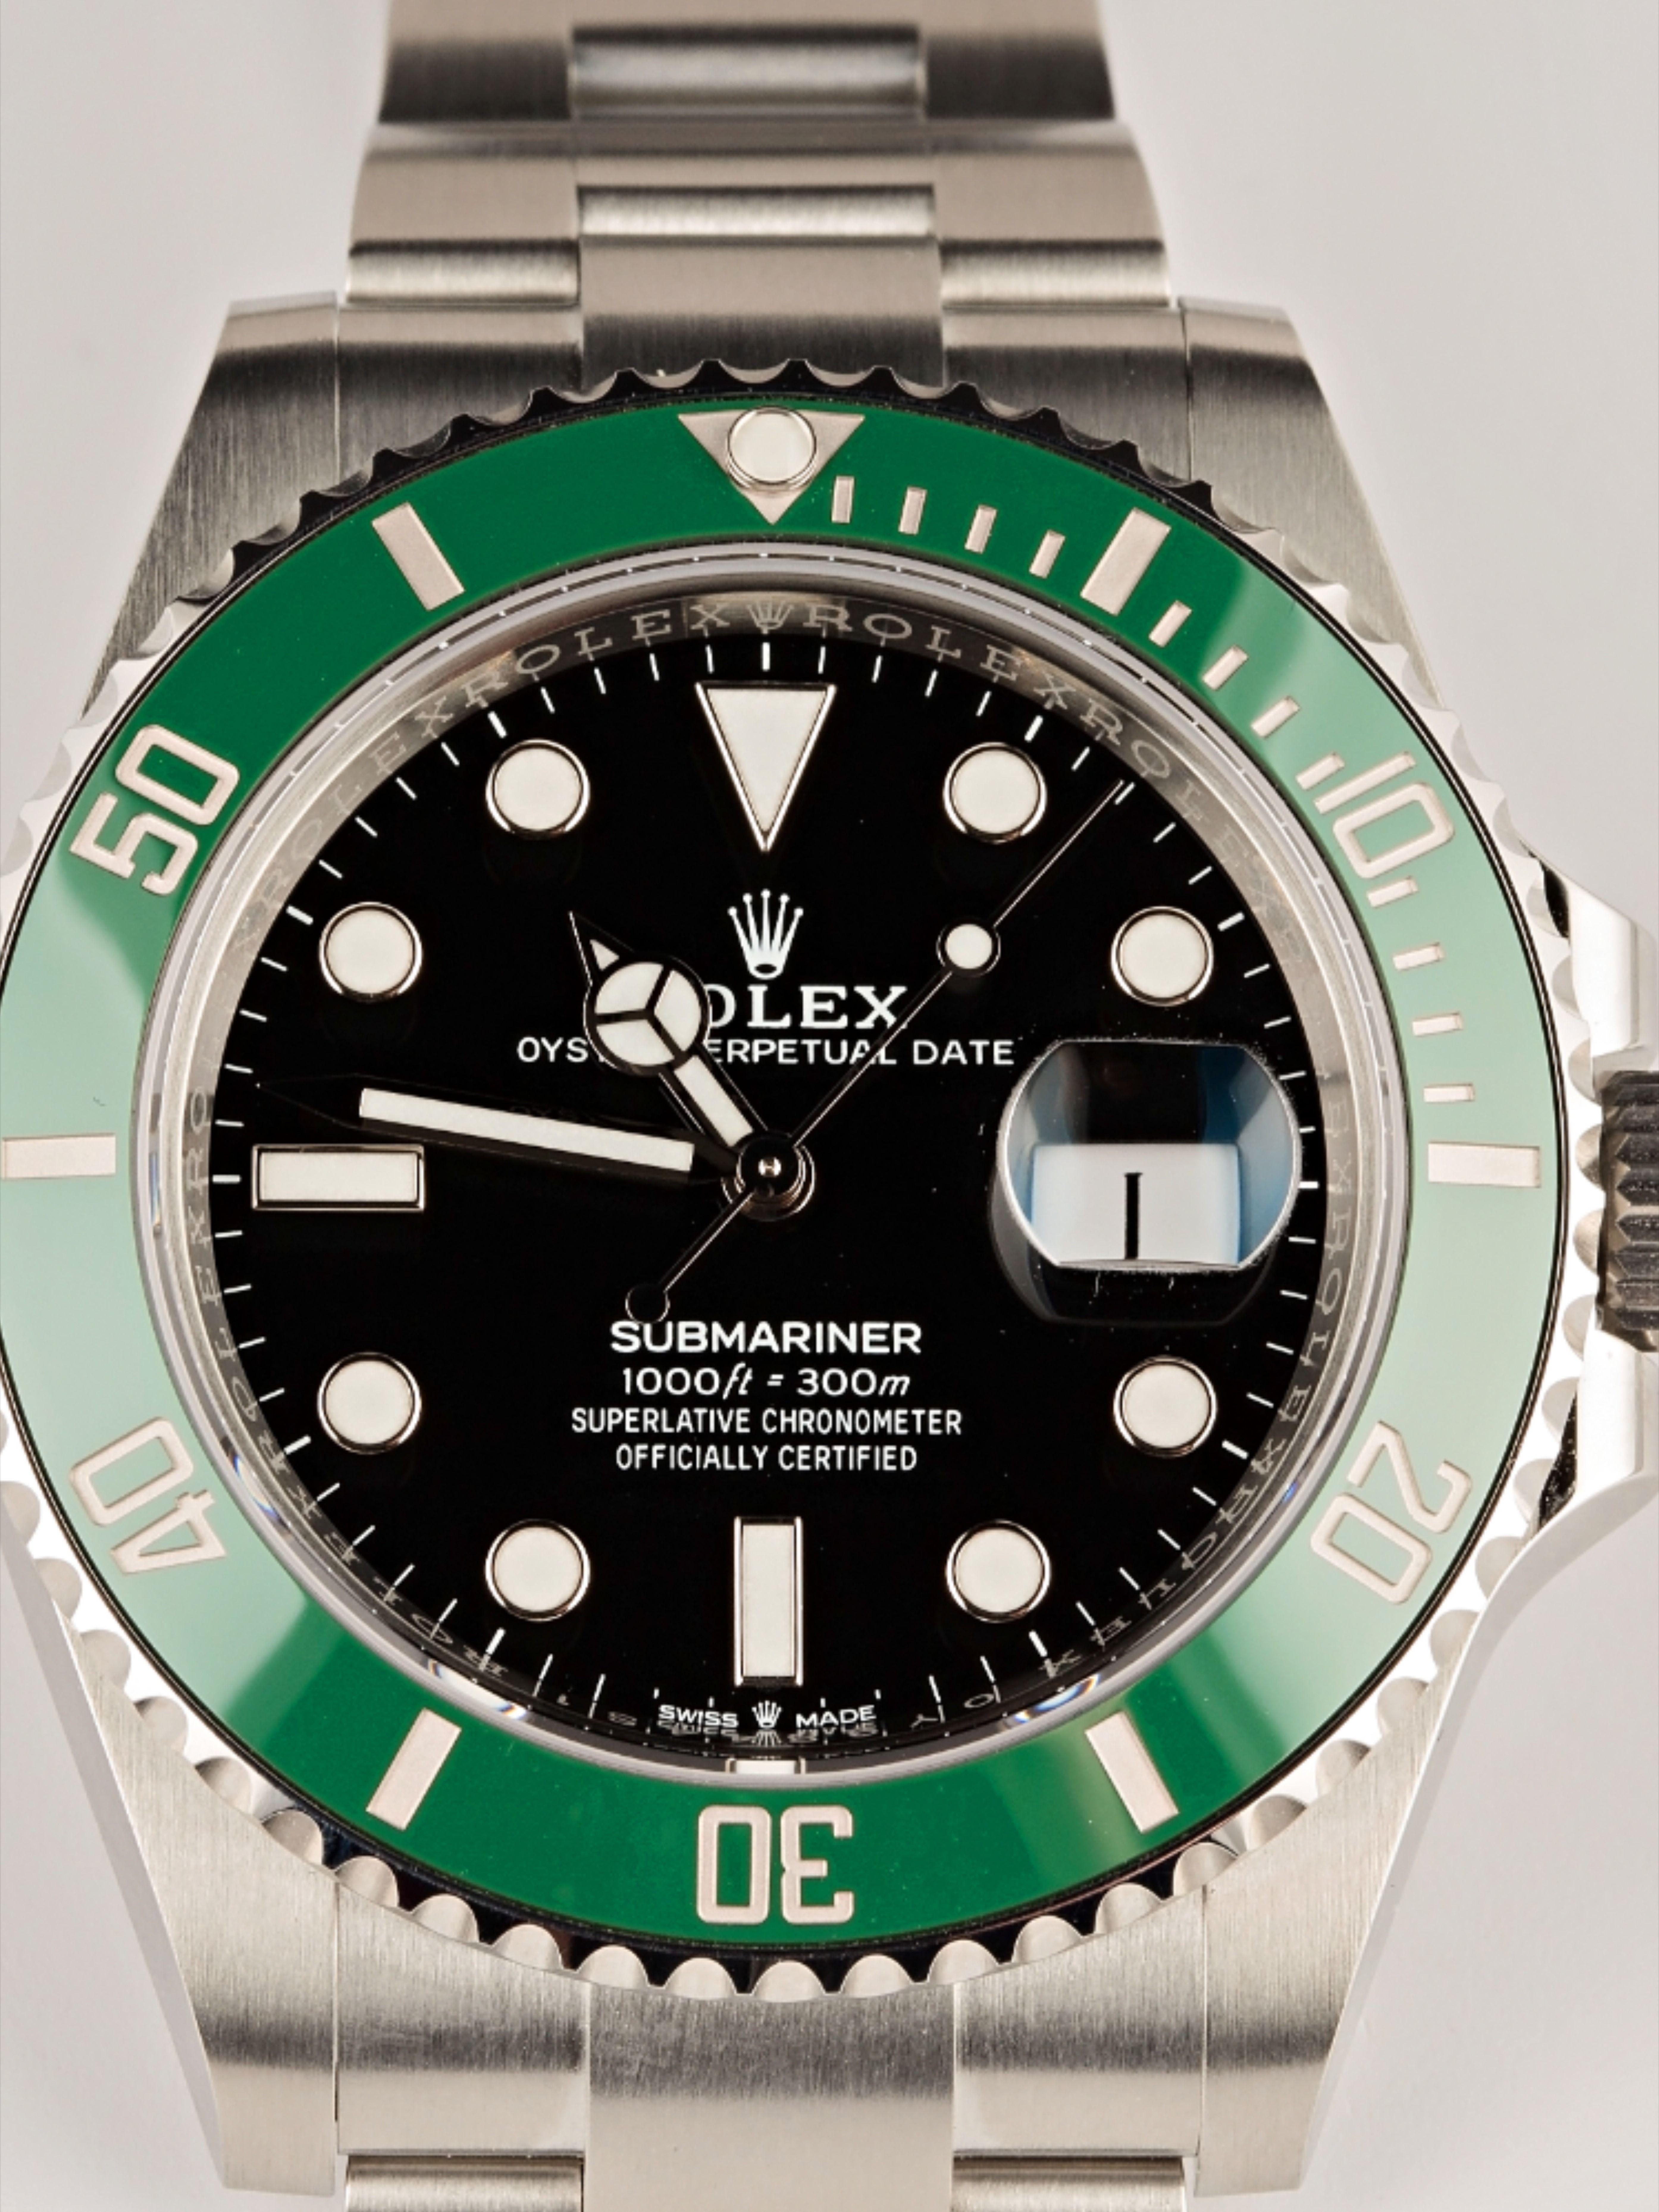 Rolex Submariner Date 126610lv Green Ceramic 41mm In 2020 Rolex Submariner Rolex Submariner Green Rolex Watches Submariner